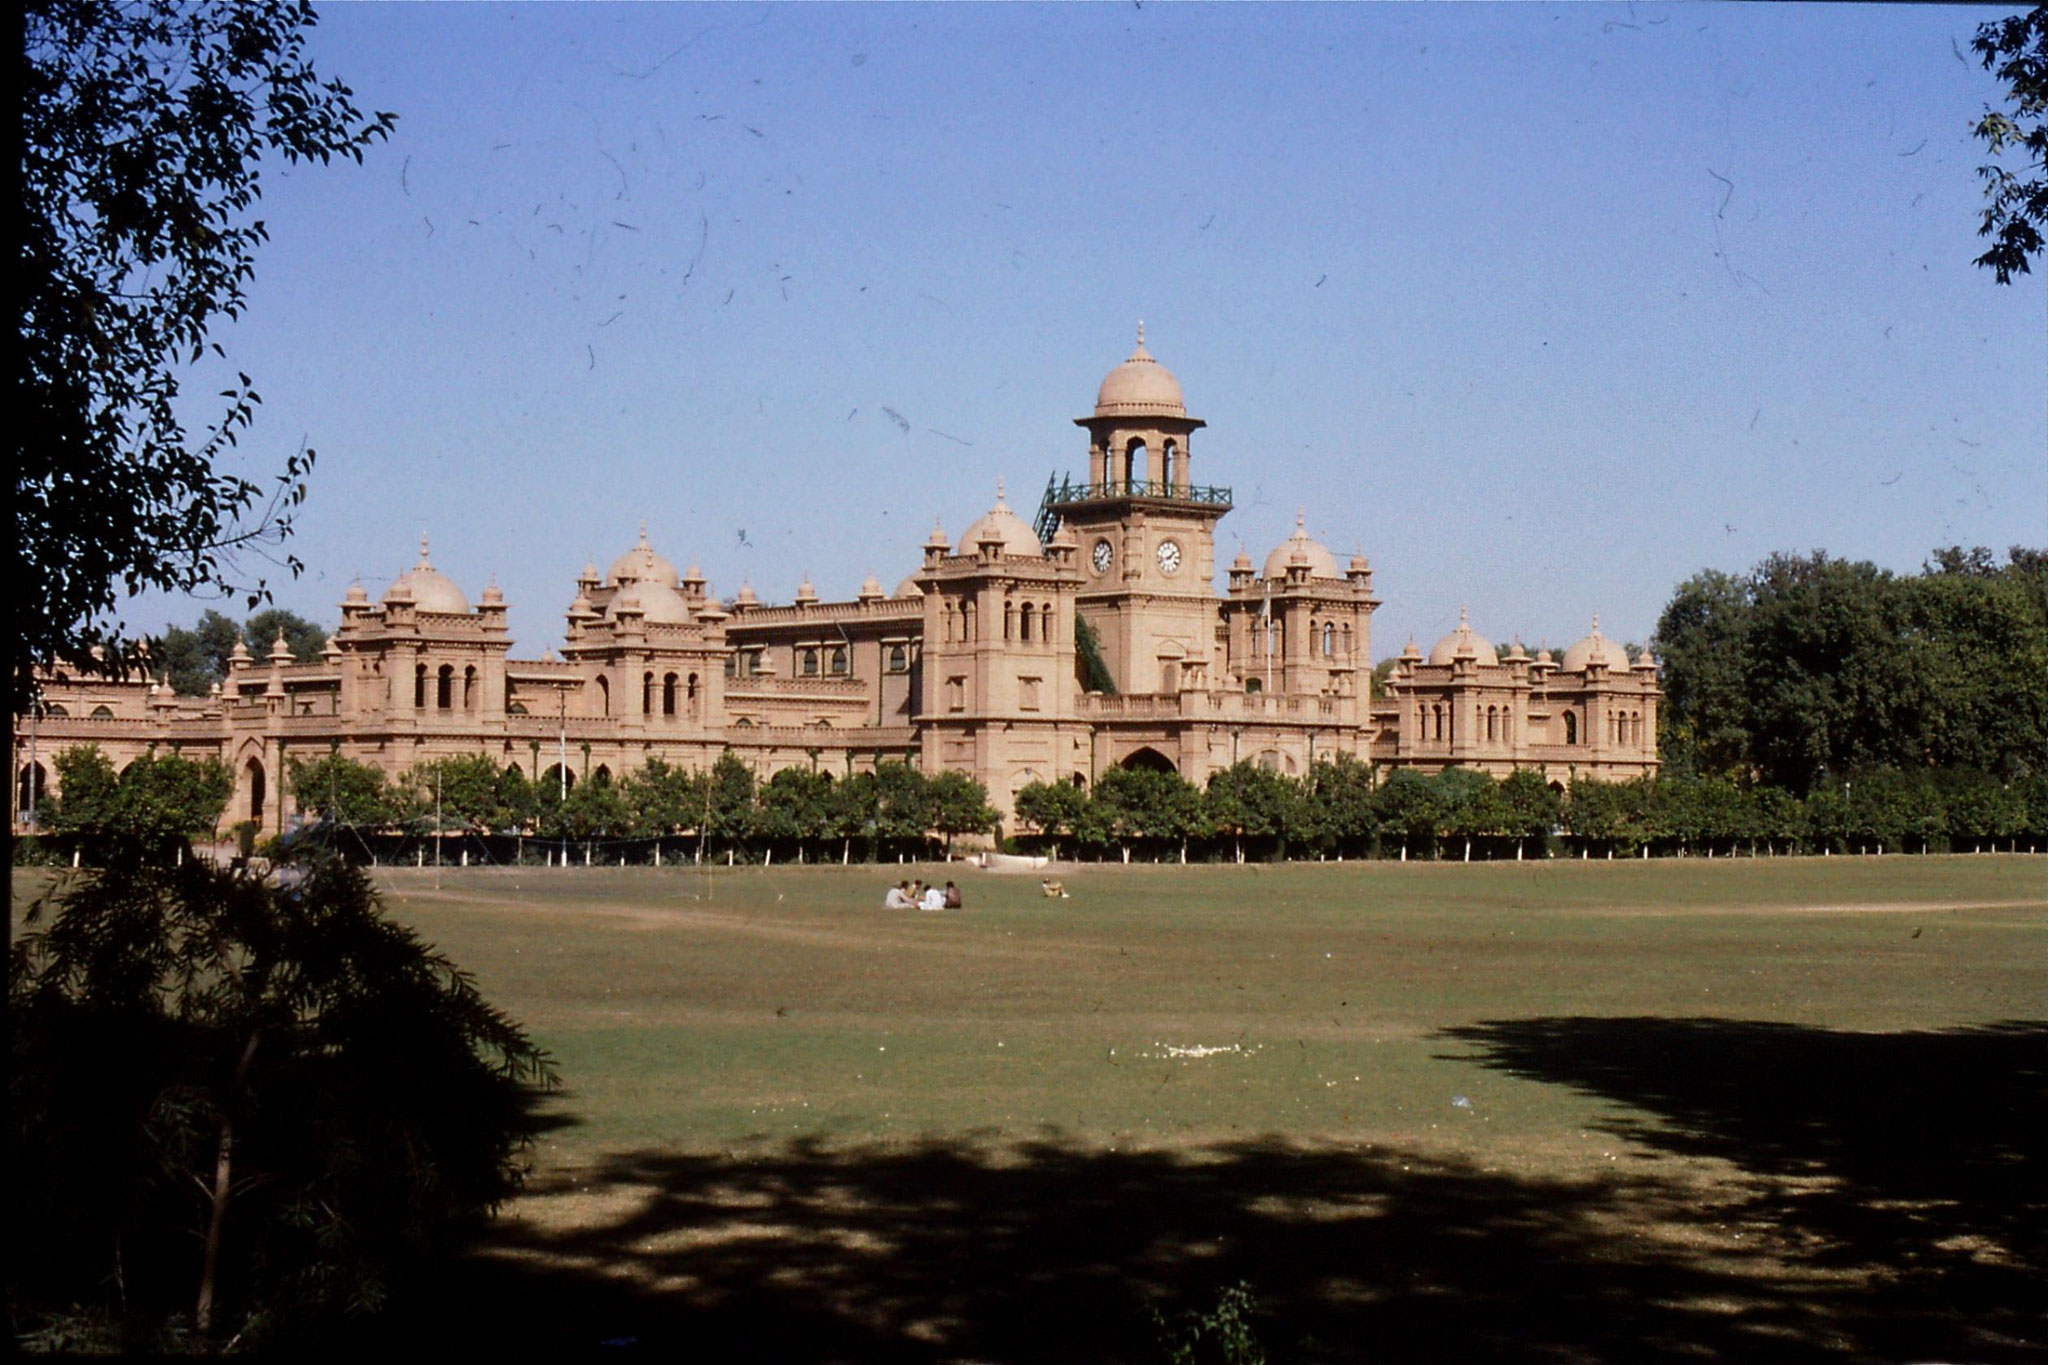 6/11/1989: 20: Islamia College